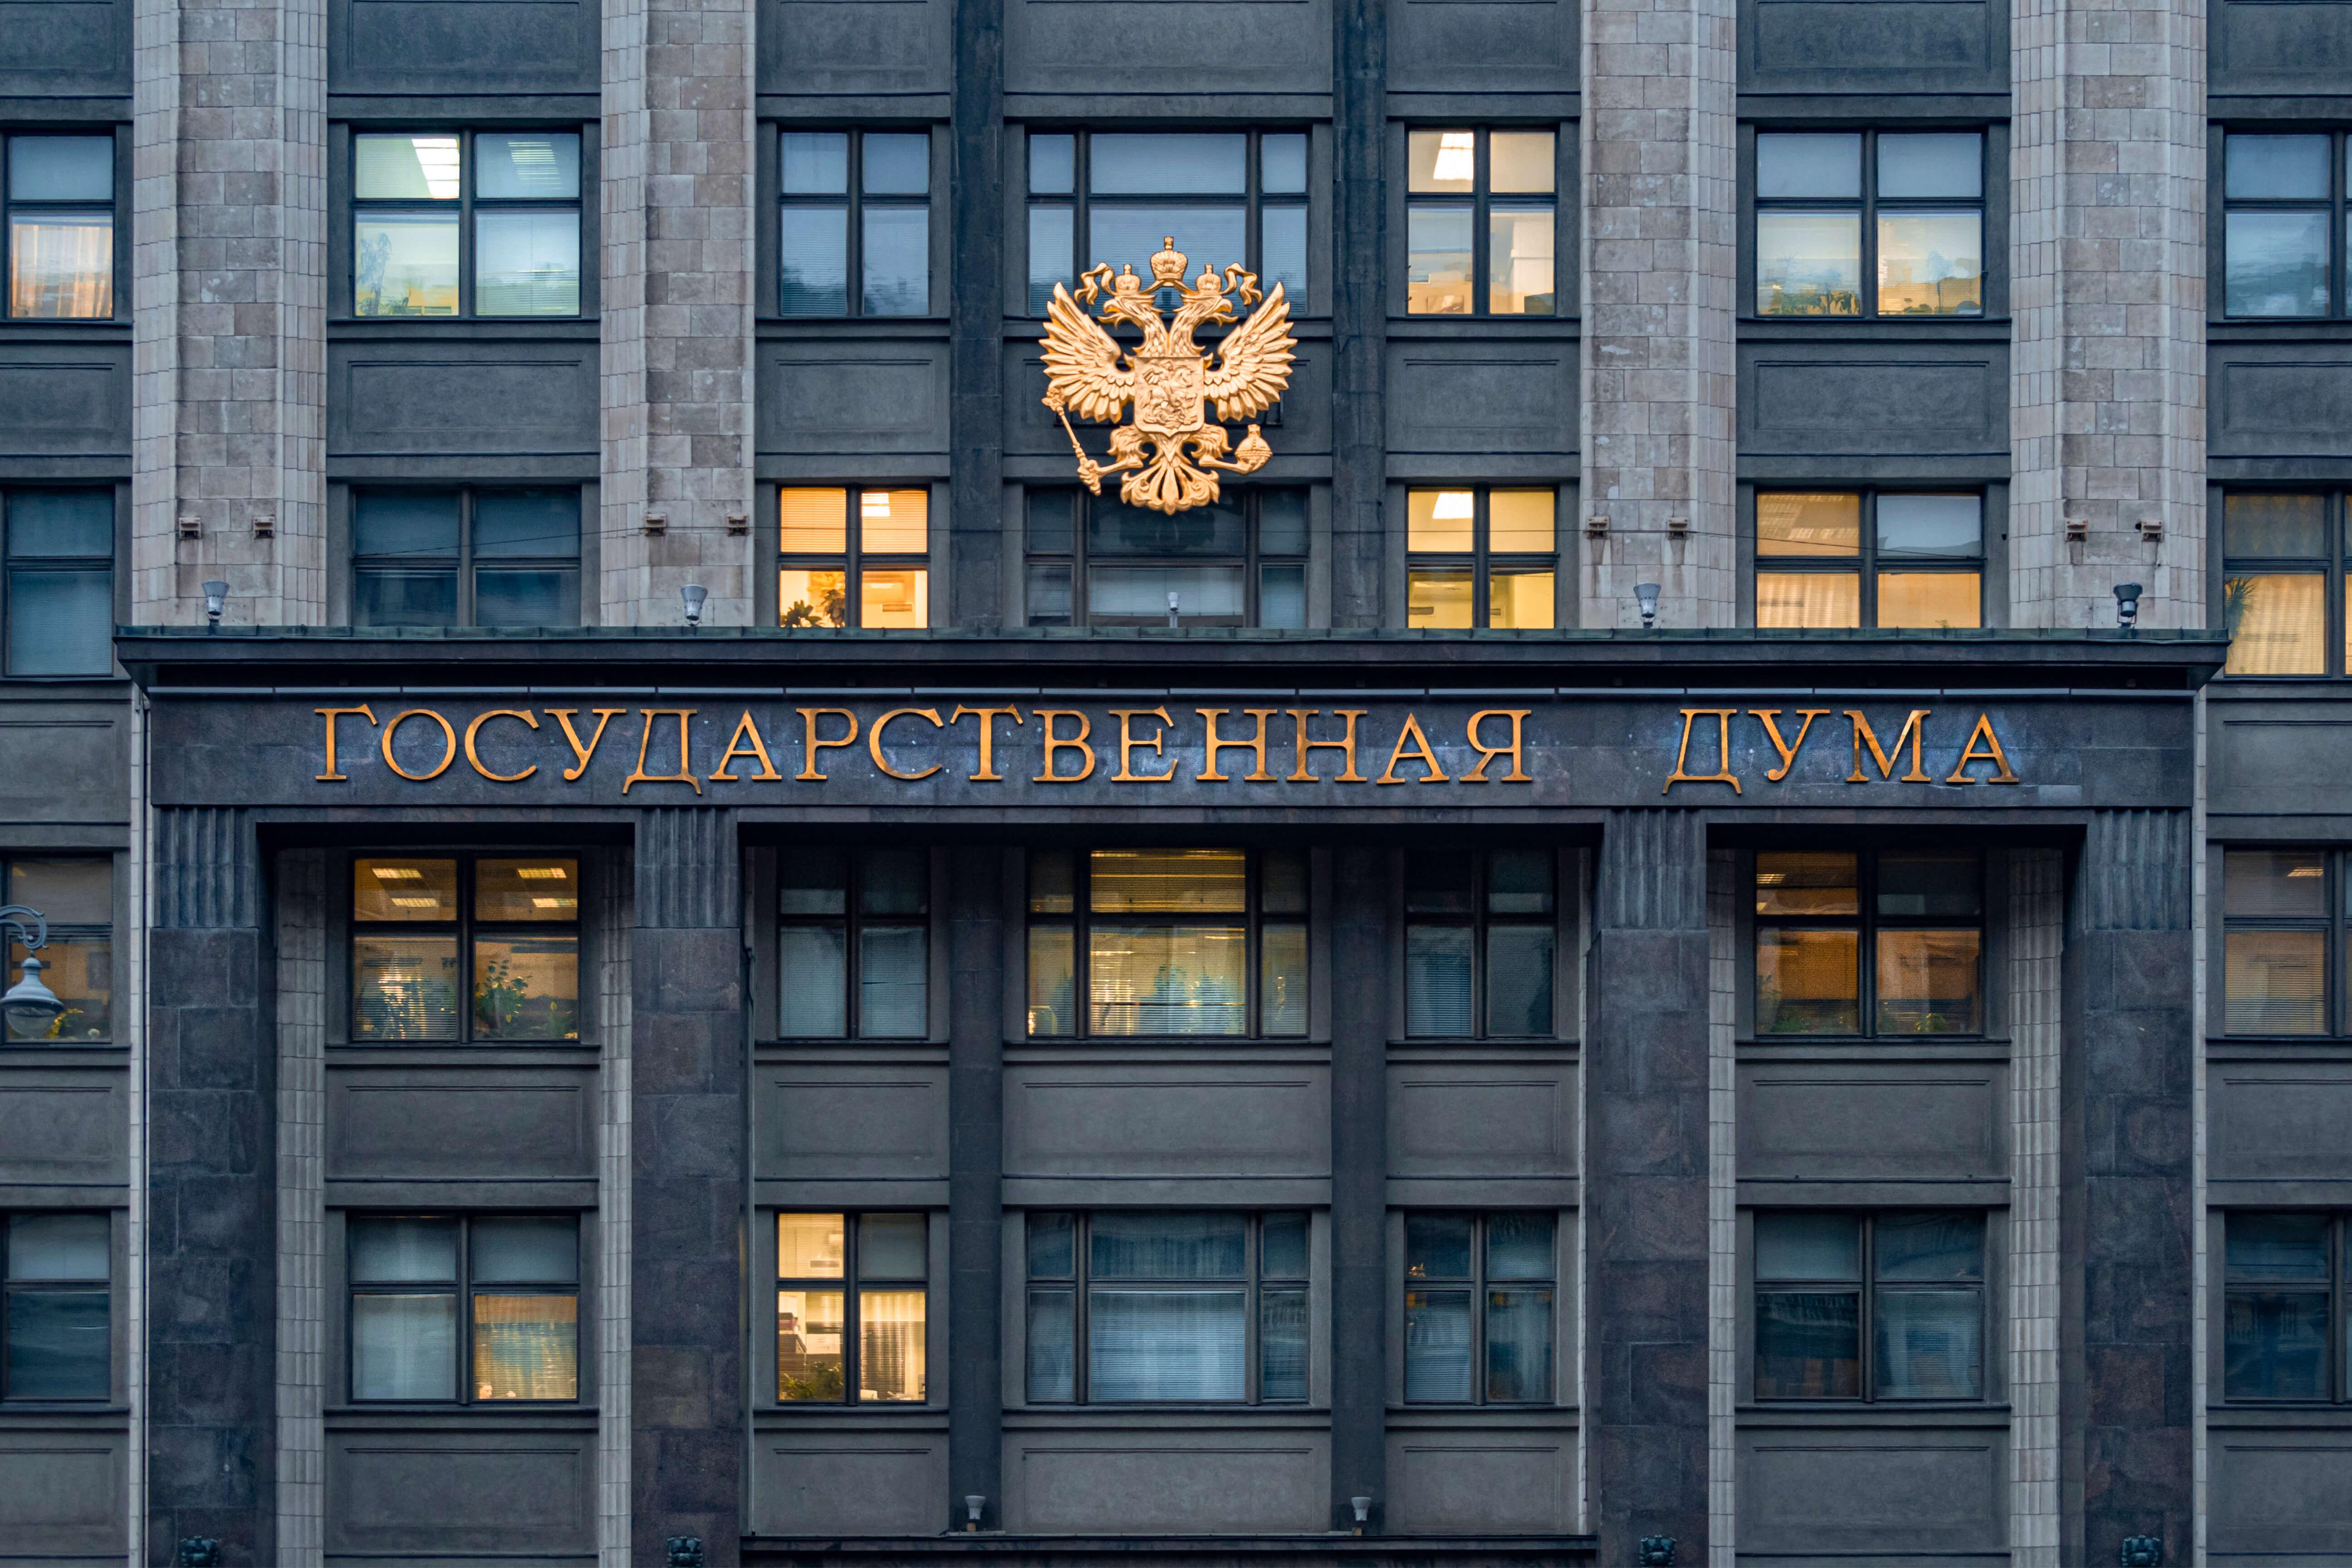 Konstantin Kokoshkin/Globallookpress.com